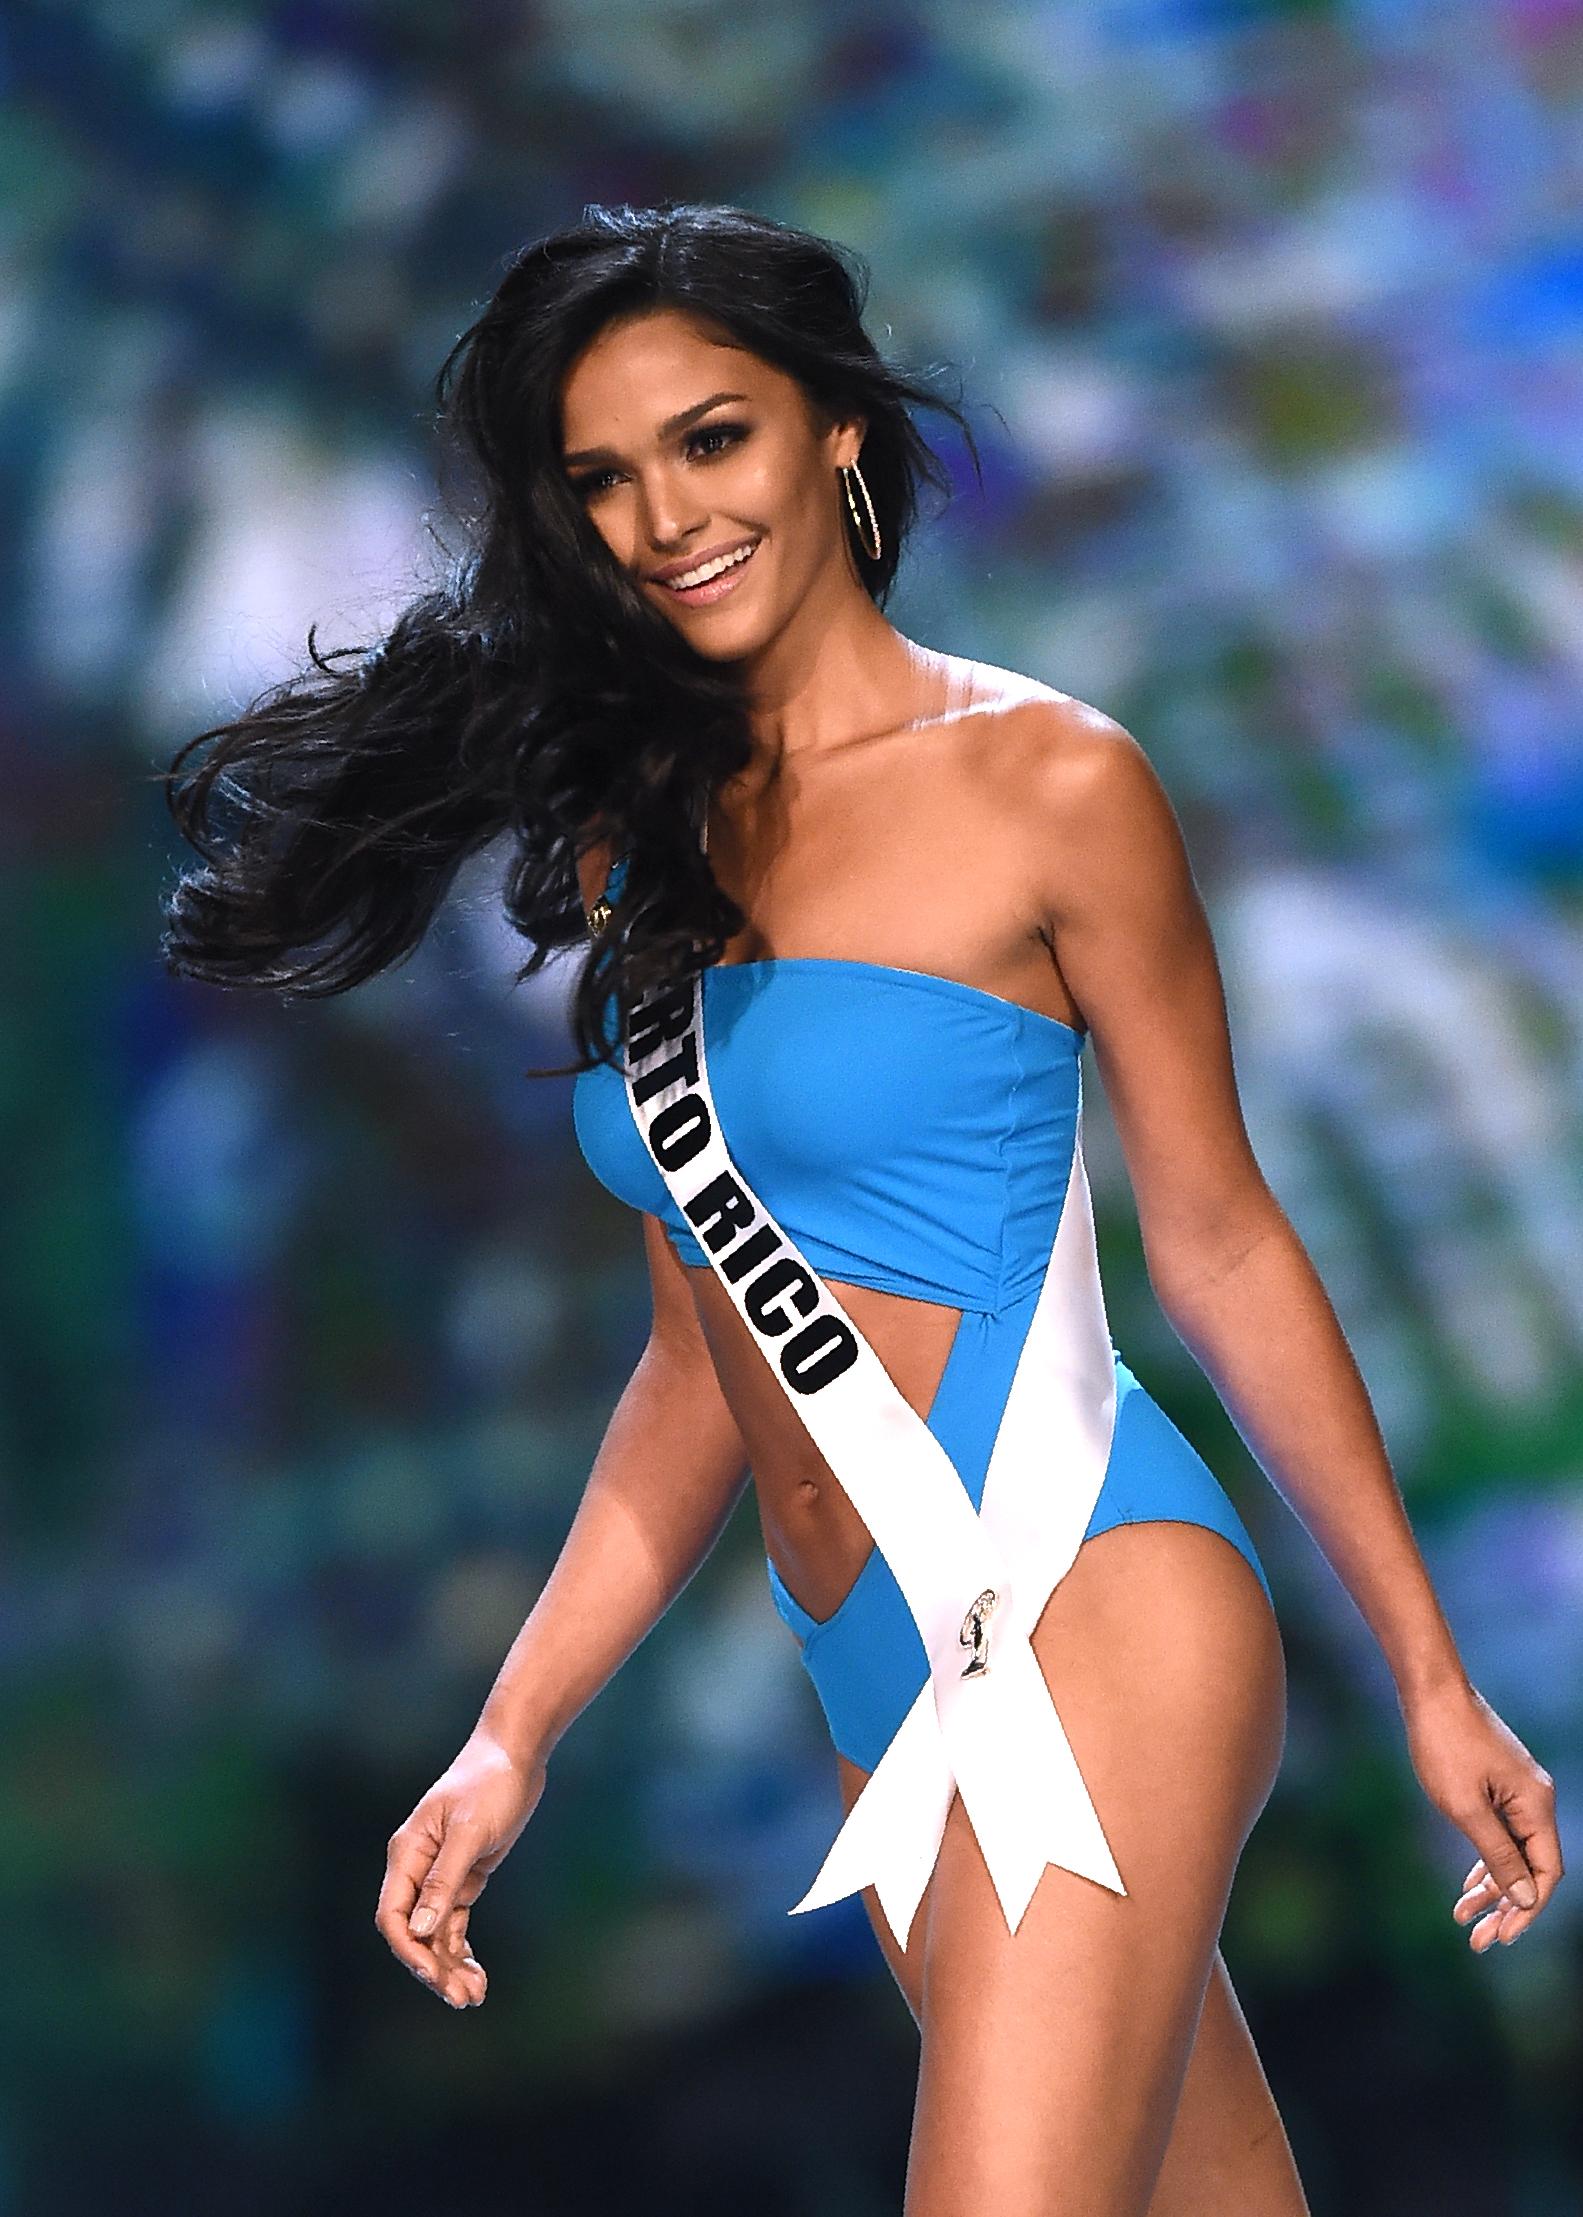 Miss Puerto Rico Kiara Ortega